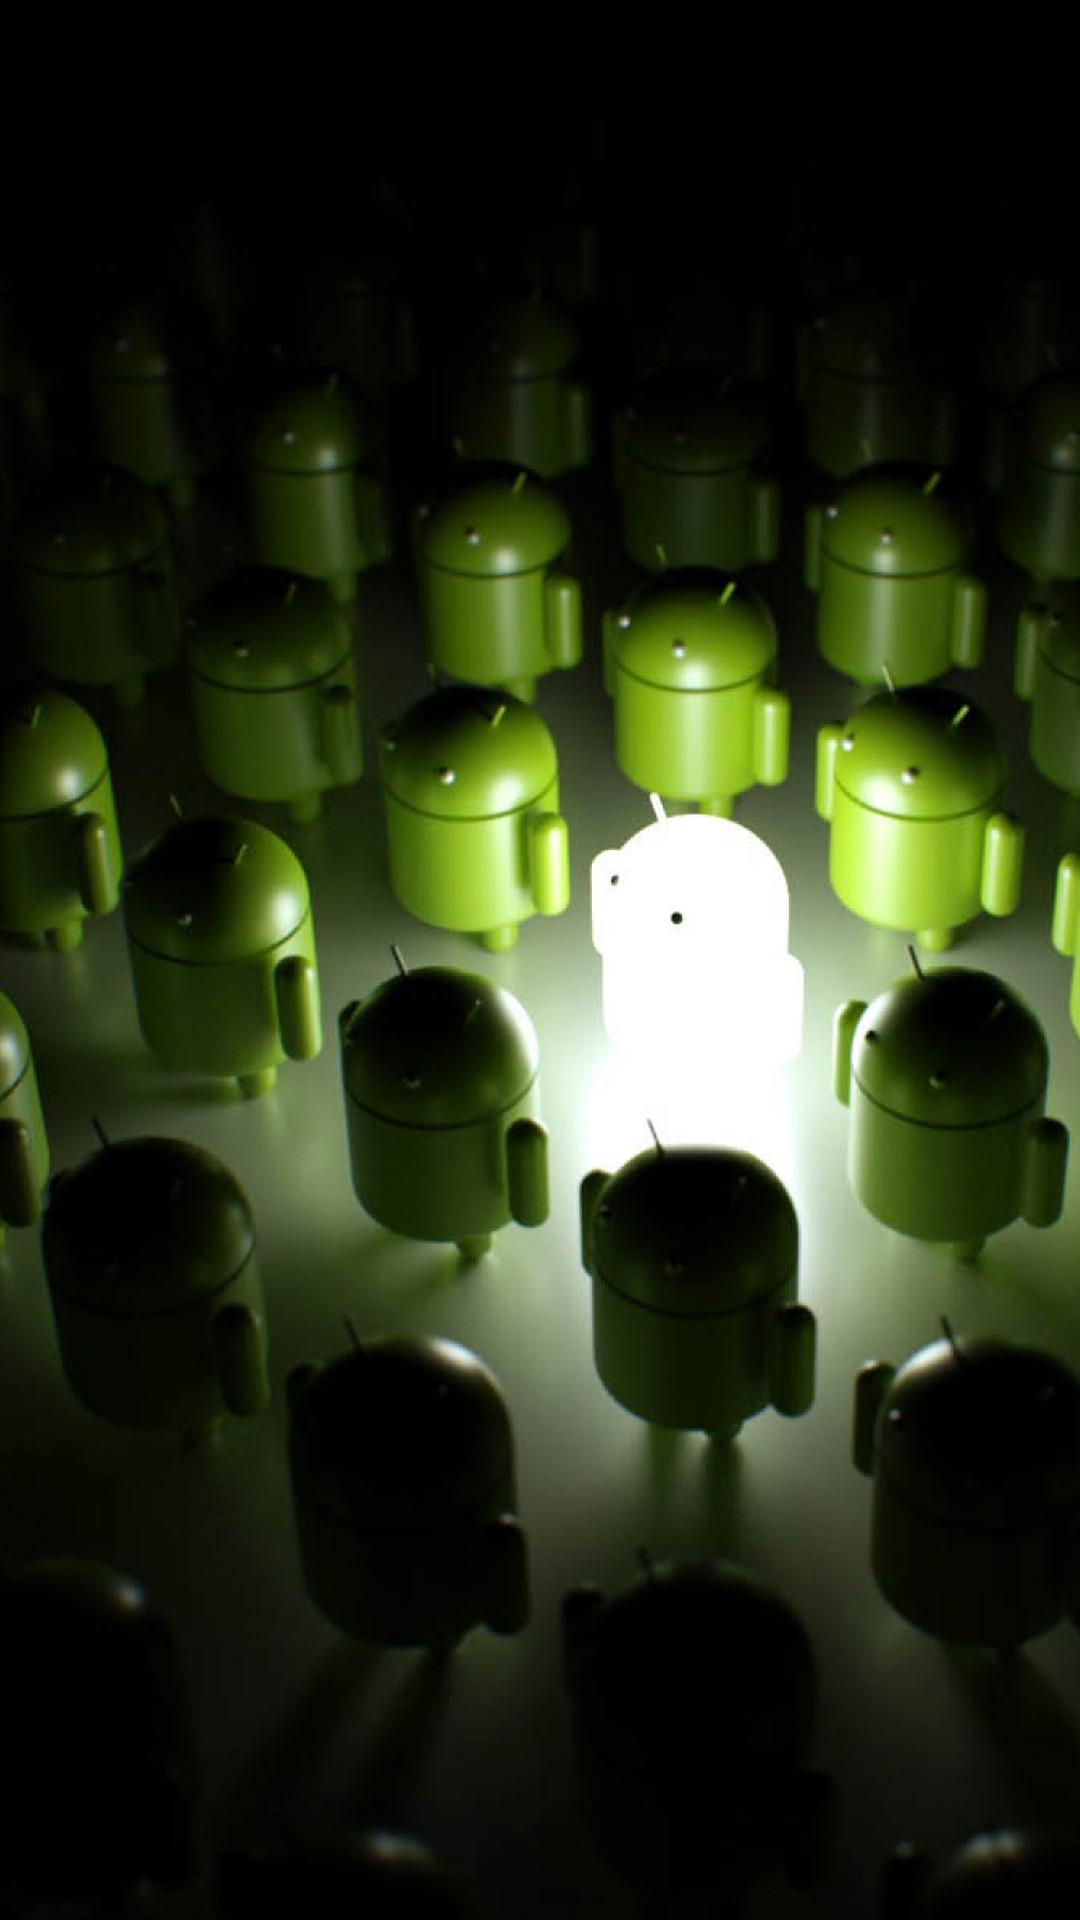 Android Lock Screen Wallpaper. ‹